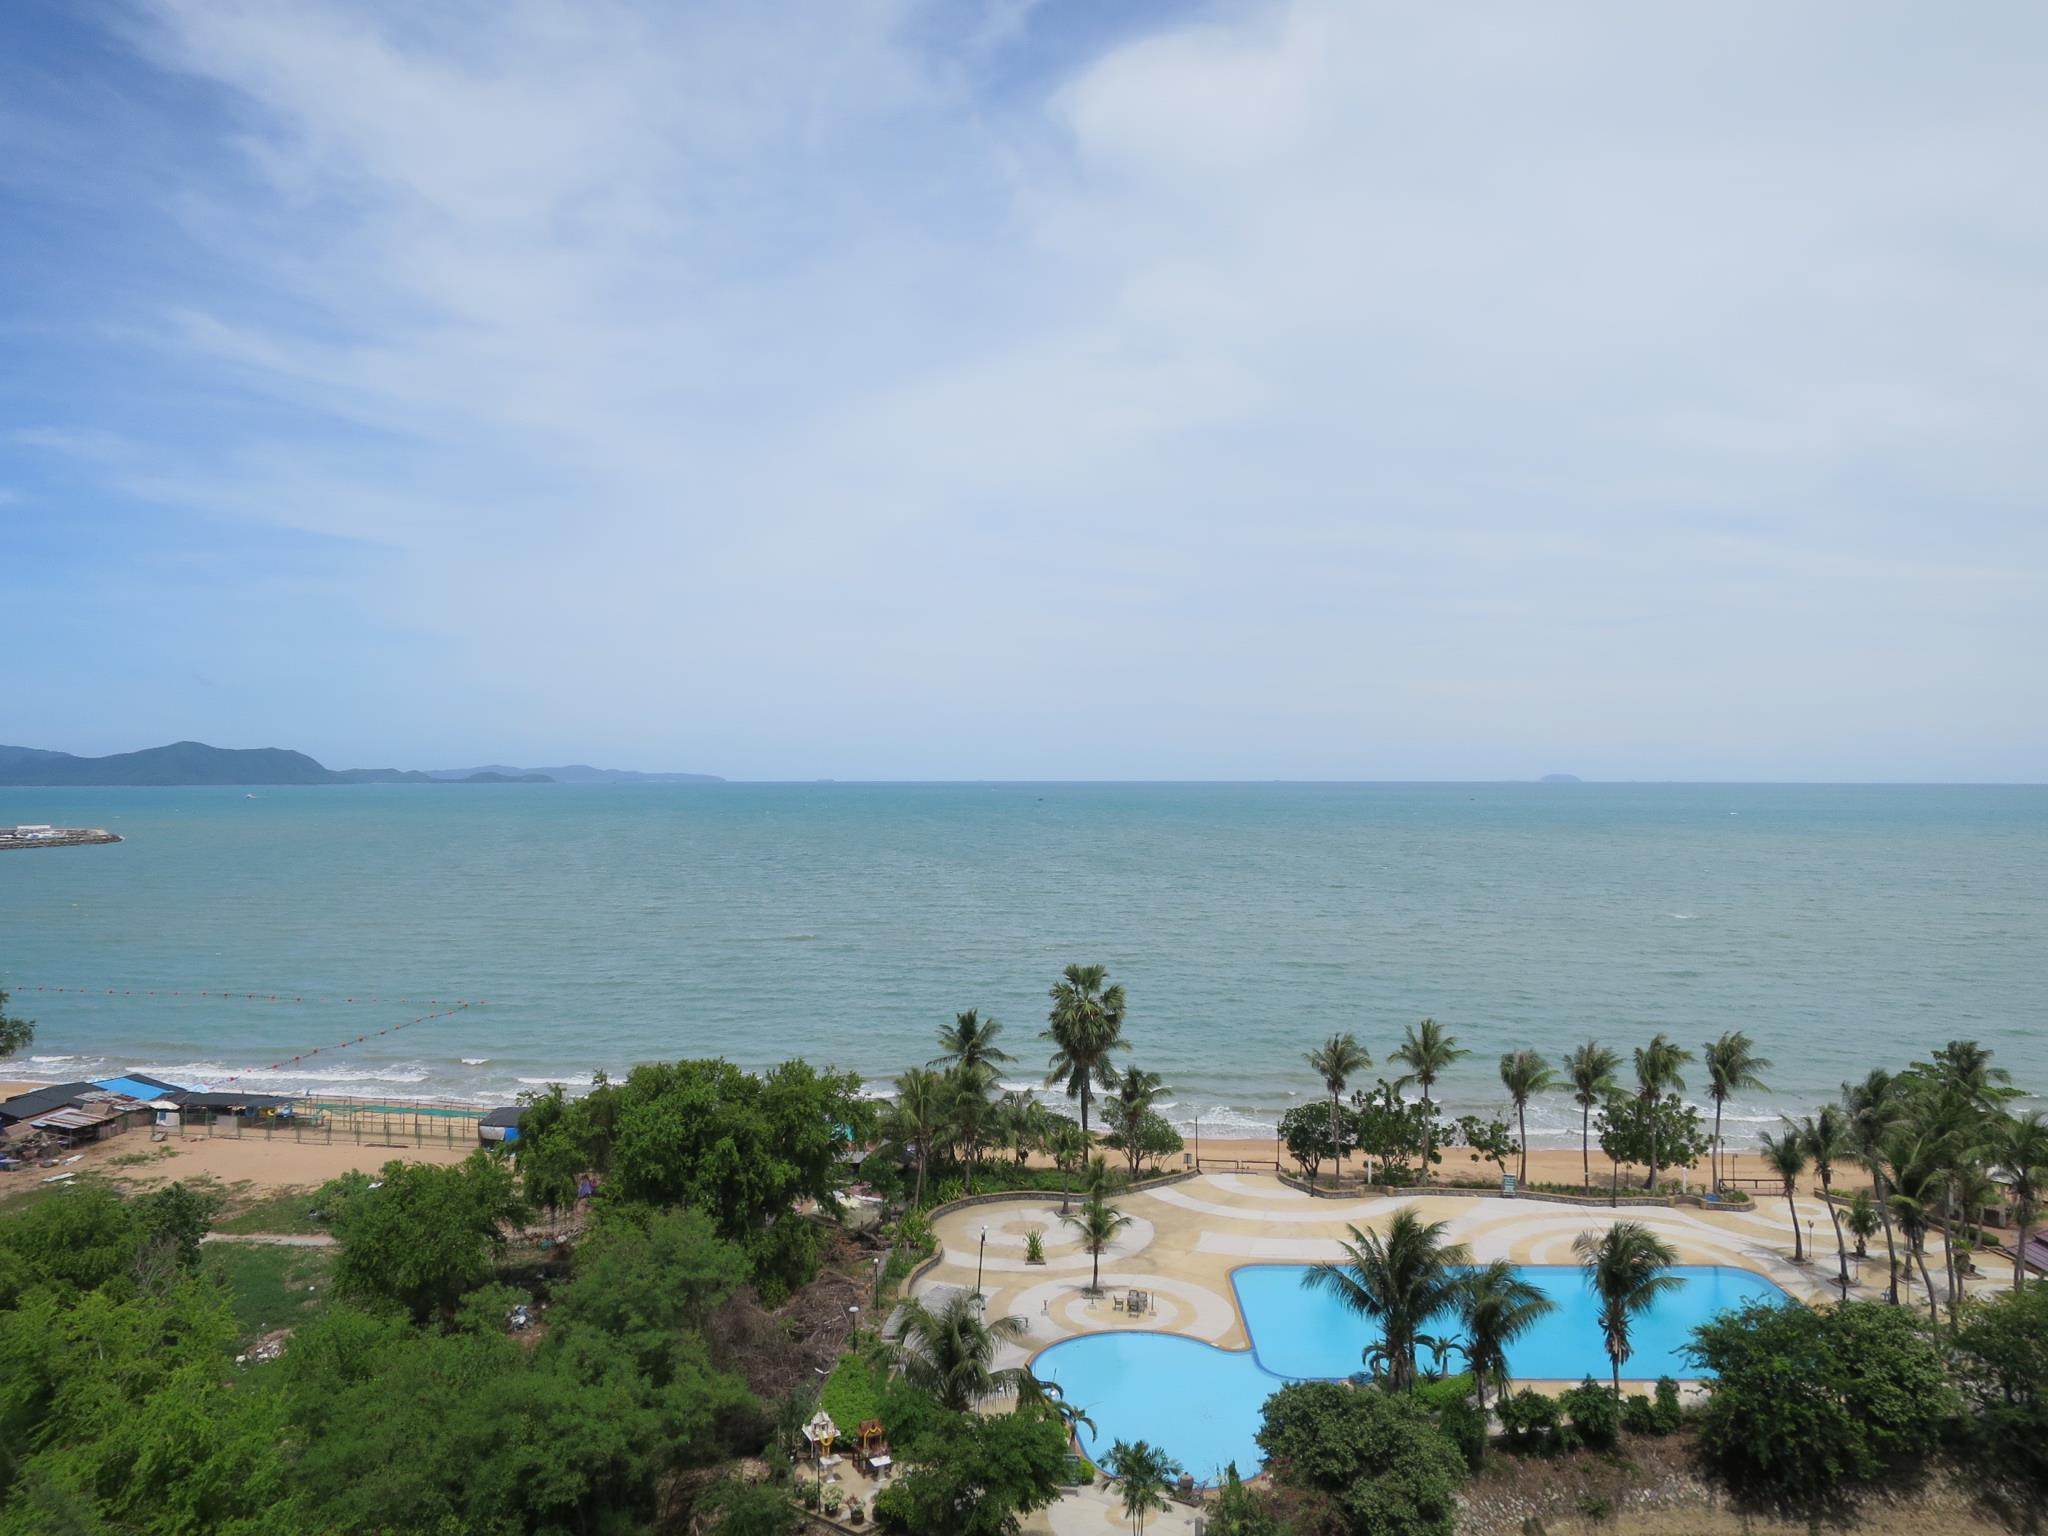 Sunshine Beach Condotel (King Studio Ocean View) Sunshine Beach Condotel (King Studio Ocean View)